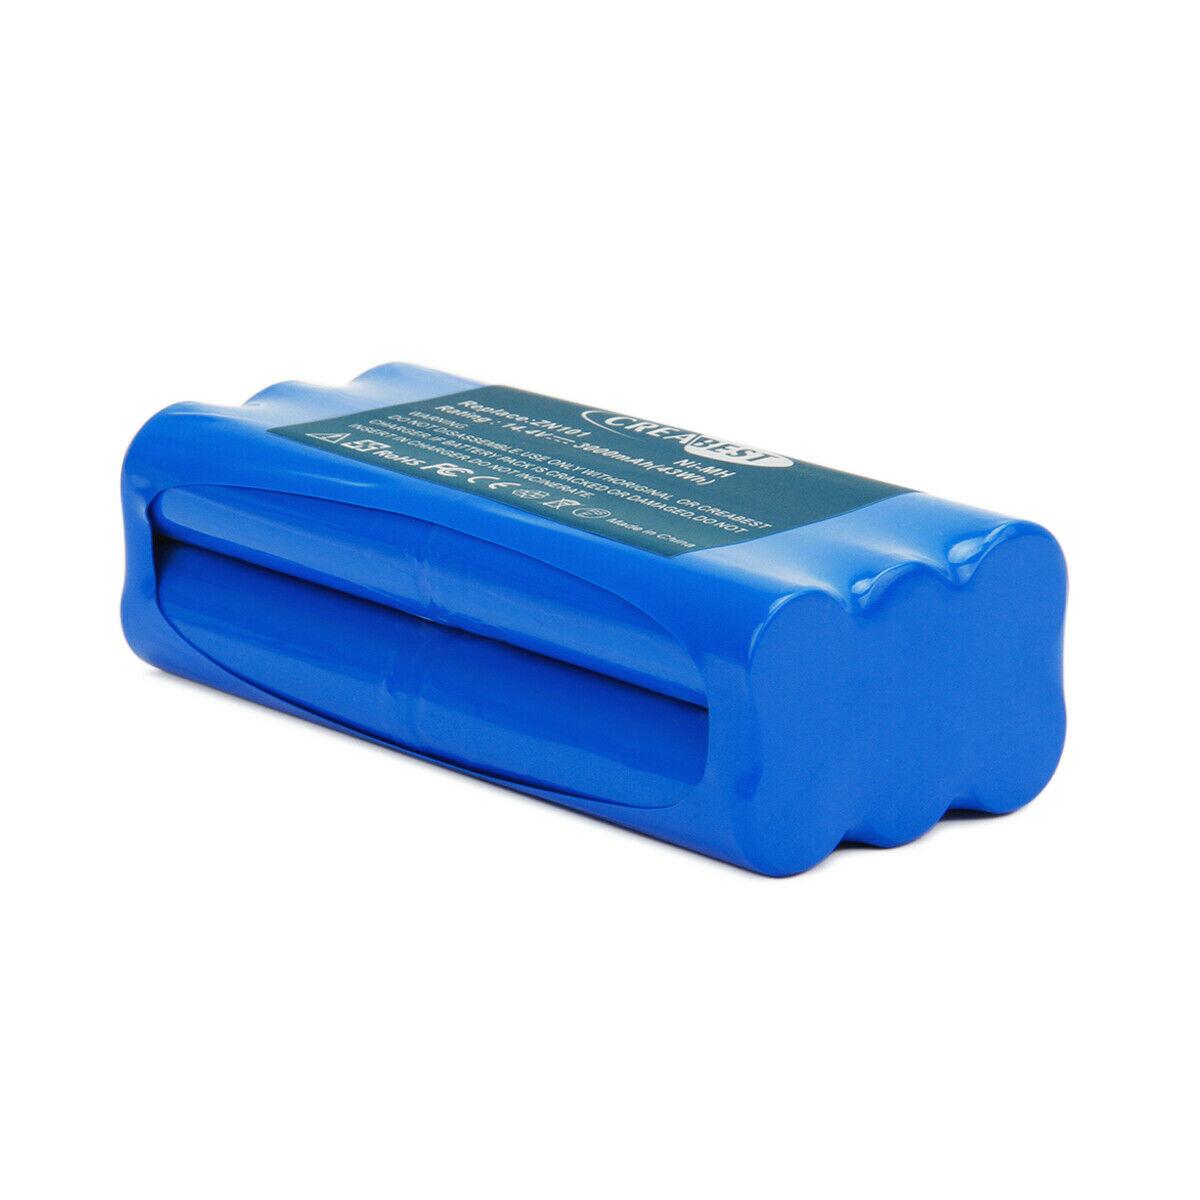 14.4V 3000mAH Ni-MH Sichler NC5755-944 Dirt Devil Fusion M611 R1-l051 compatible Battery